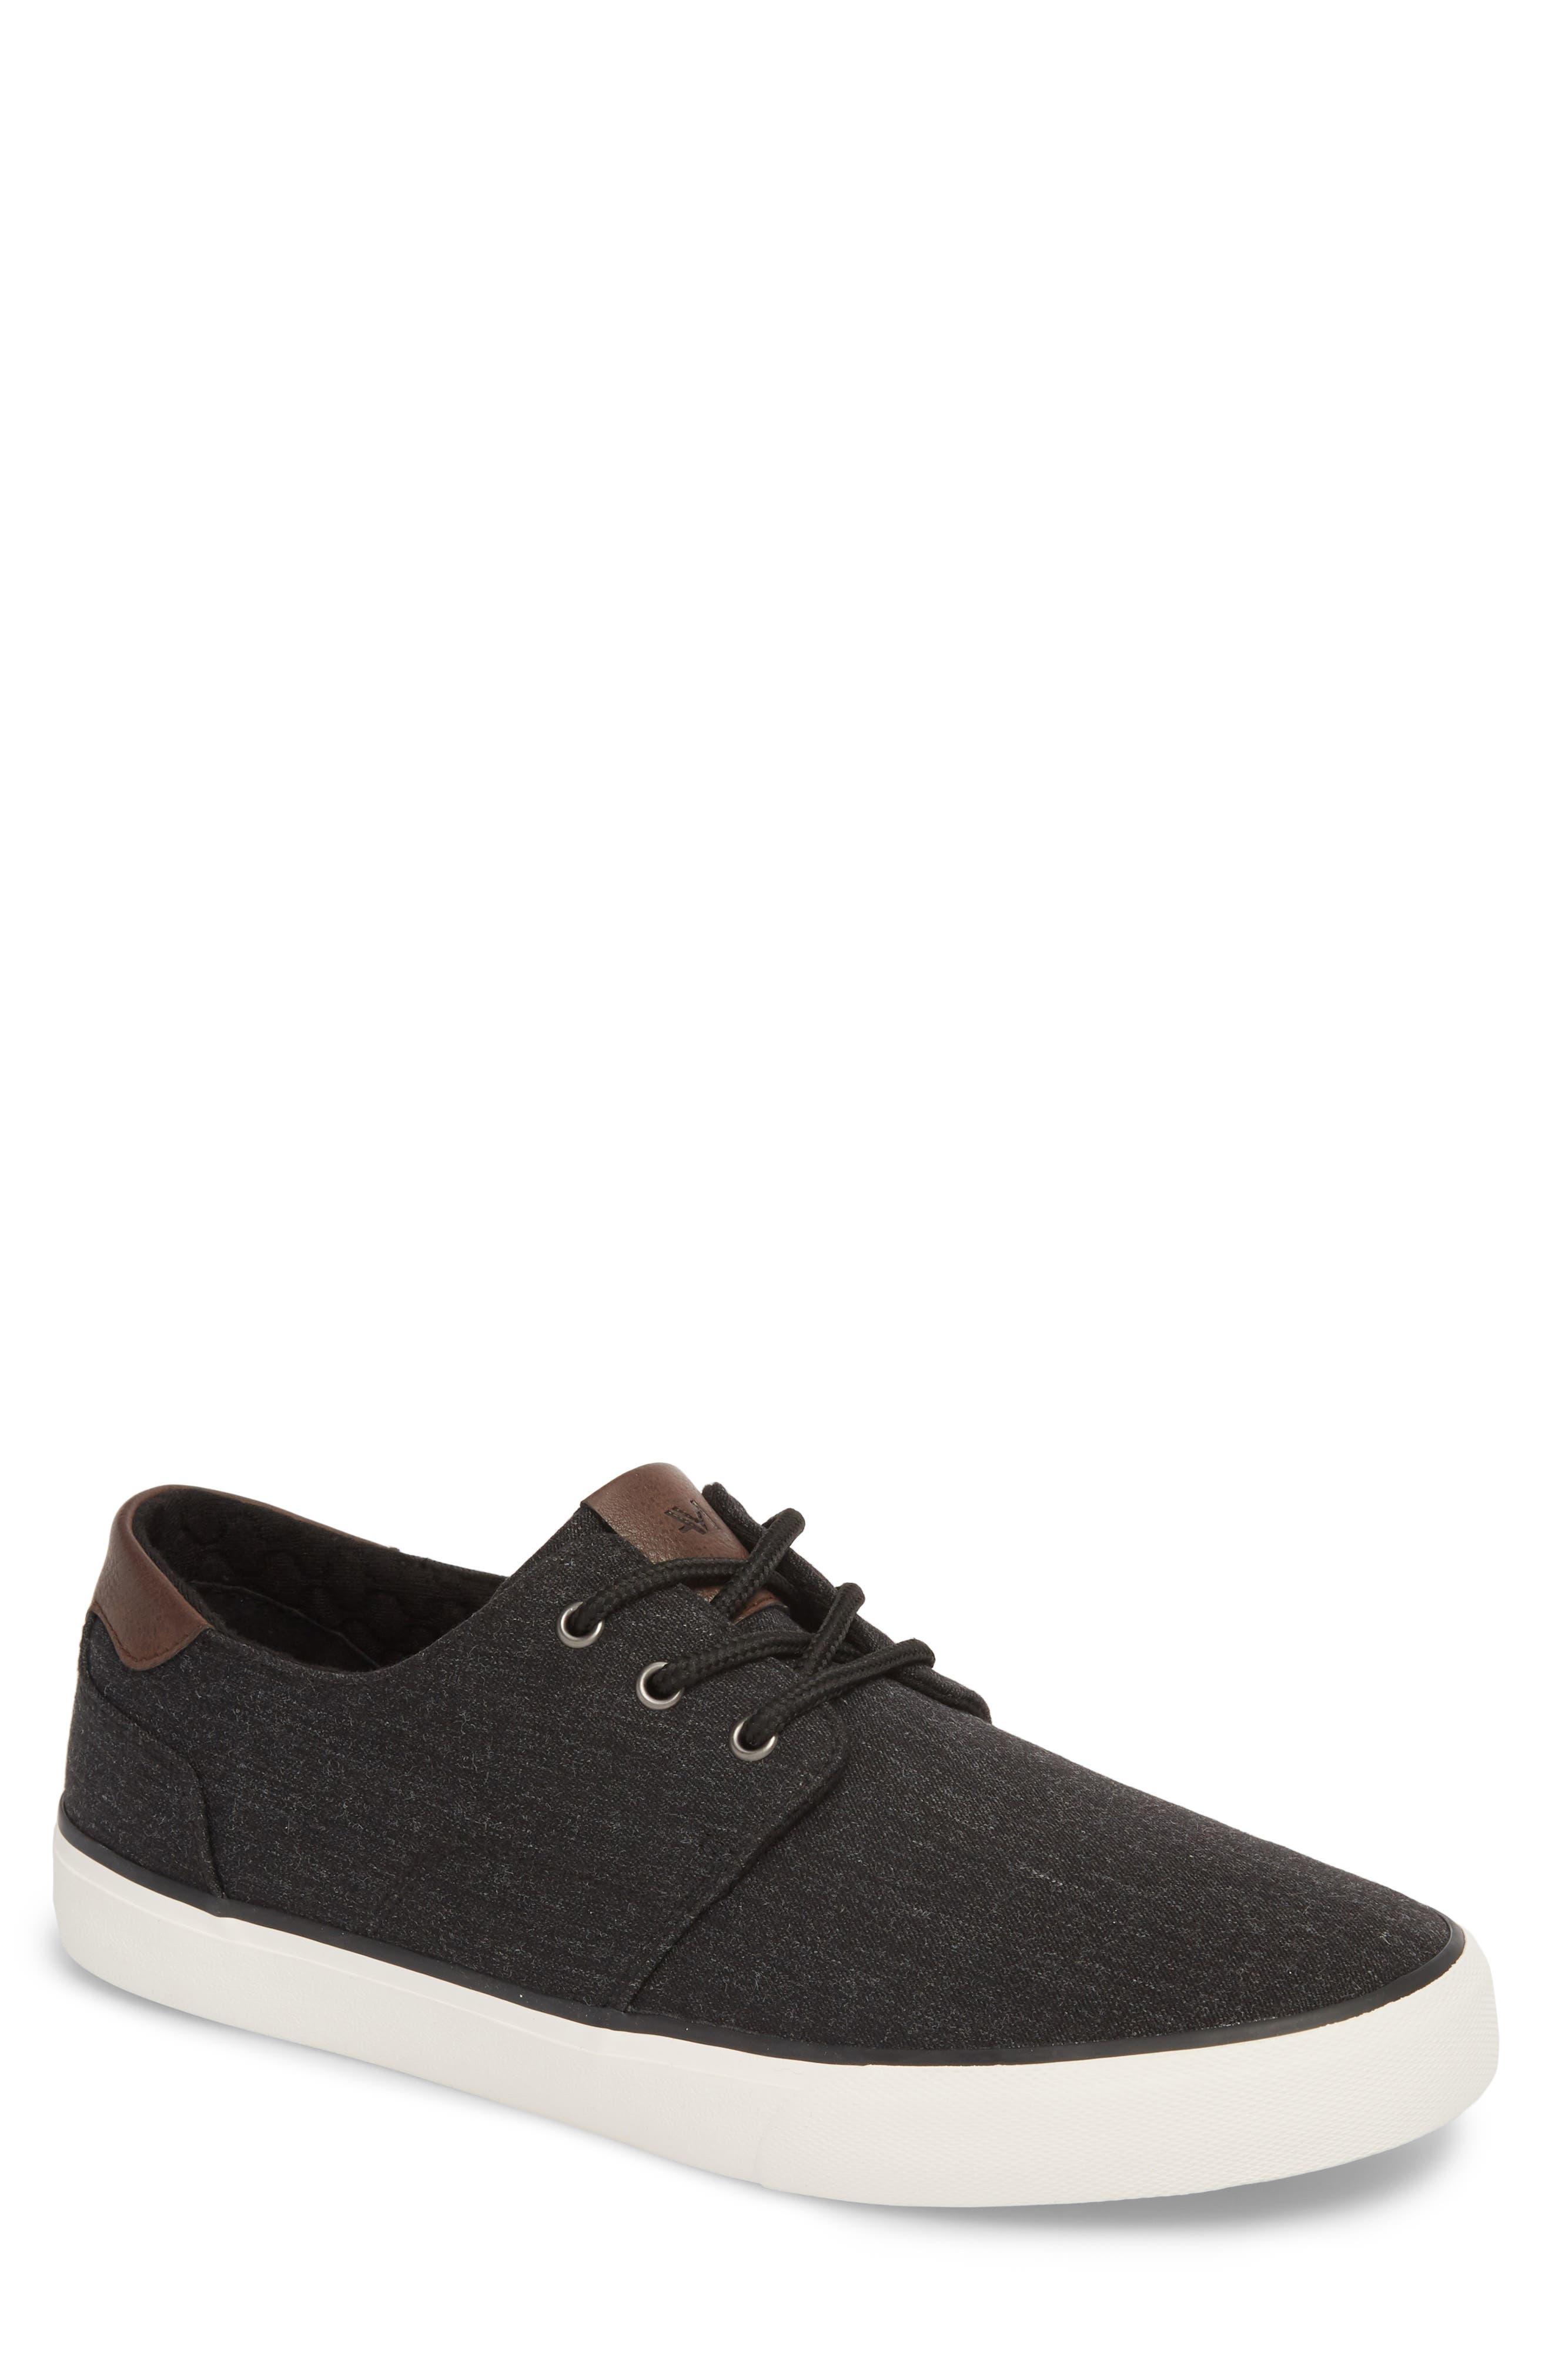 Briggs Low Top Sneaker,                         Main,                         color, 001